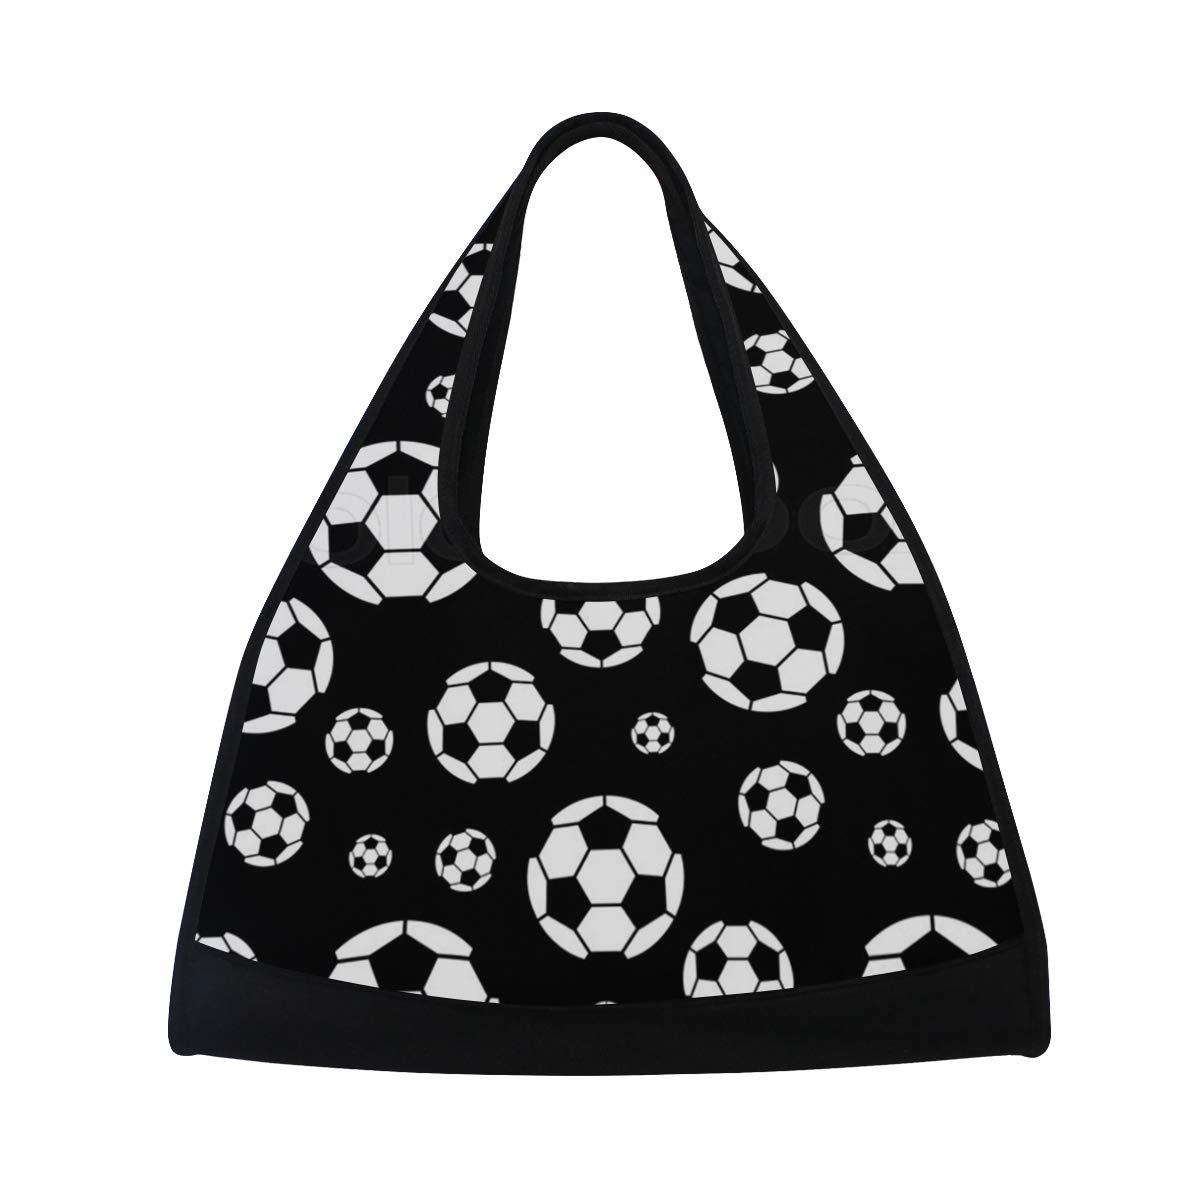 Womens Gym Bag Black and White Soccer Ball Mens Duffel Bags Duffle Luggage Travel Bag